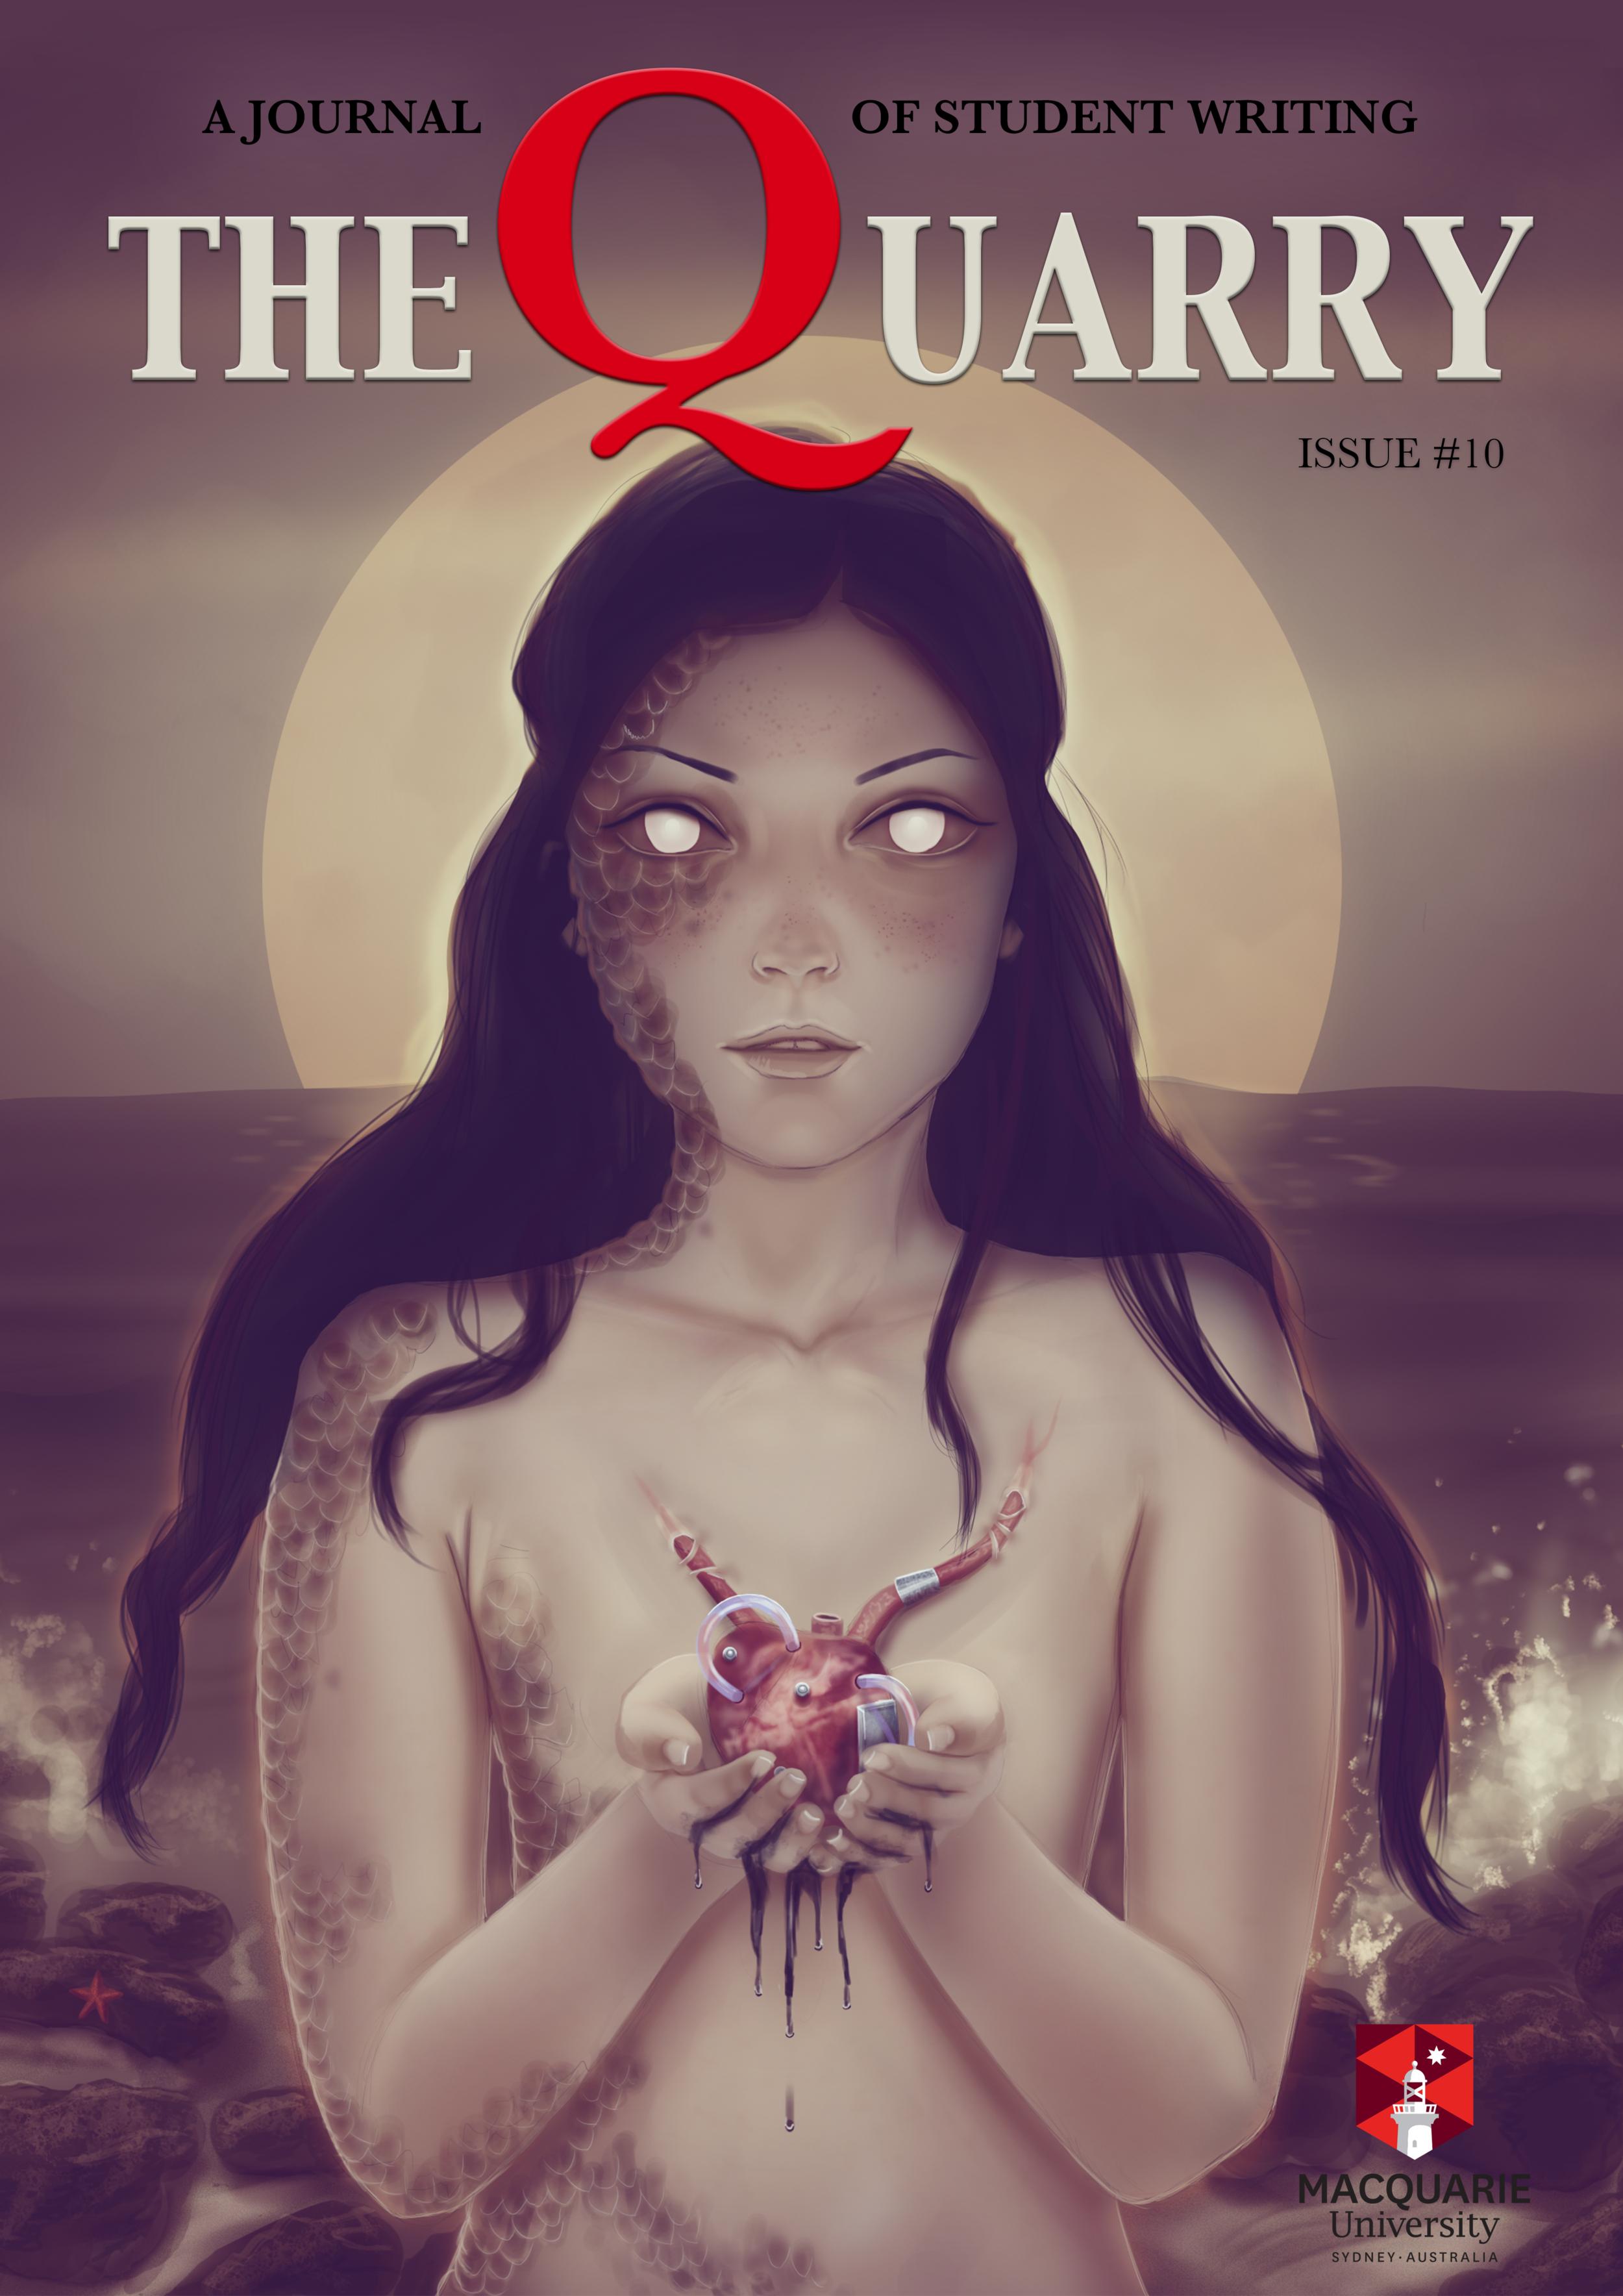 Cover art by Ailie MacKenzie, design by Teresa Peni